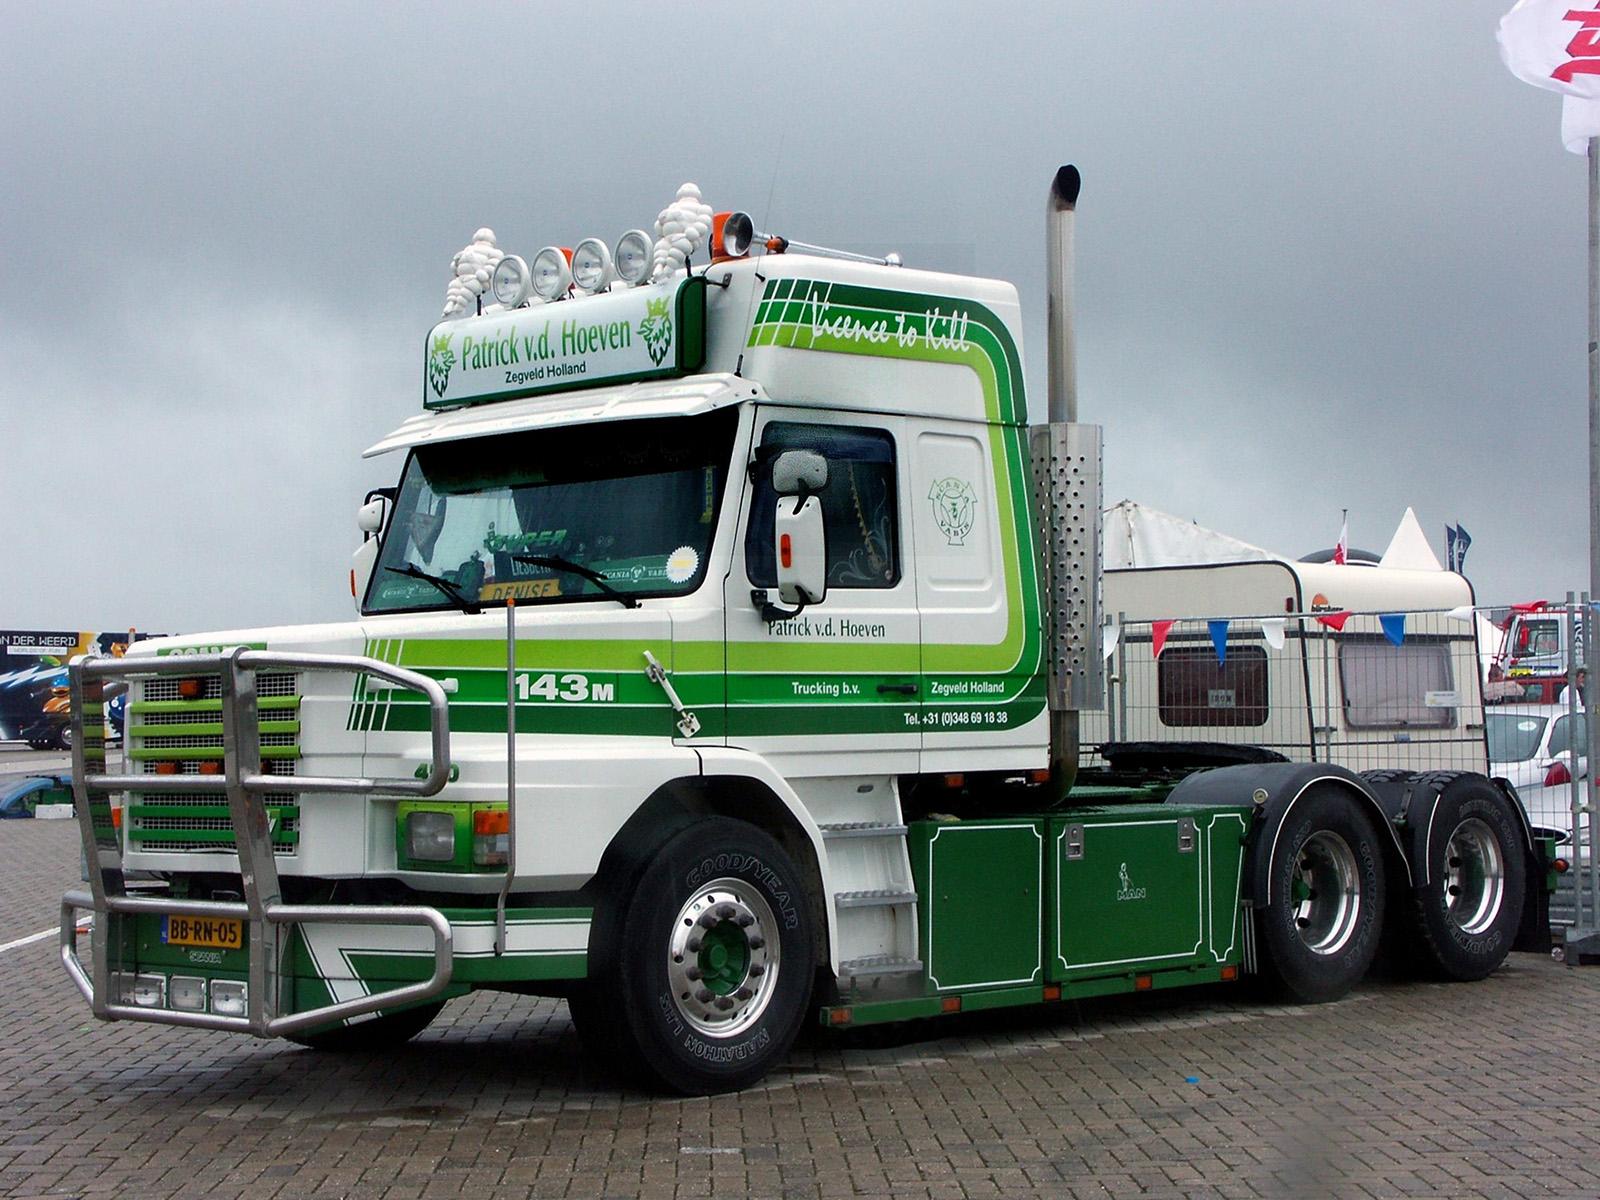 Scania-T_series_mp281_pic_46653.jpg